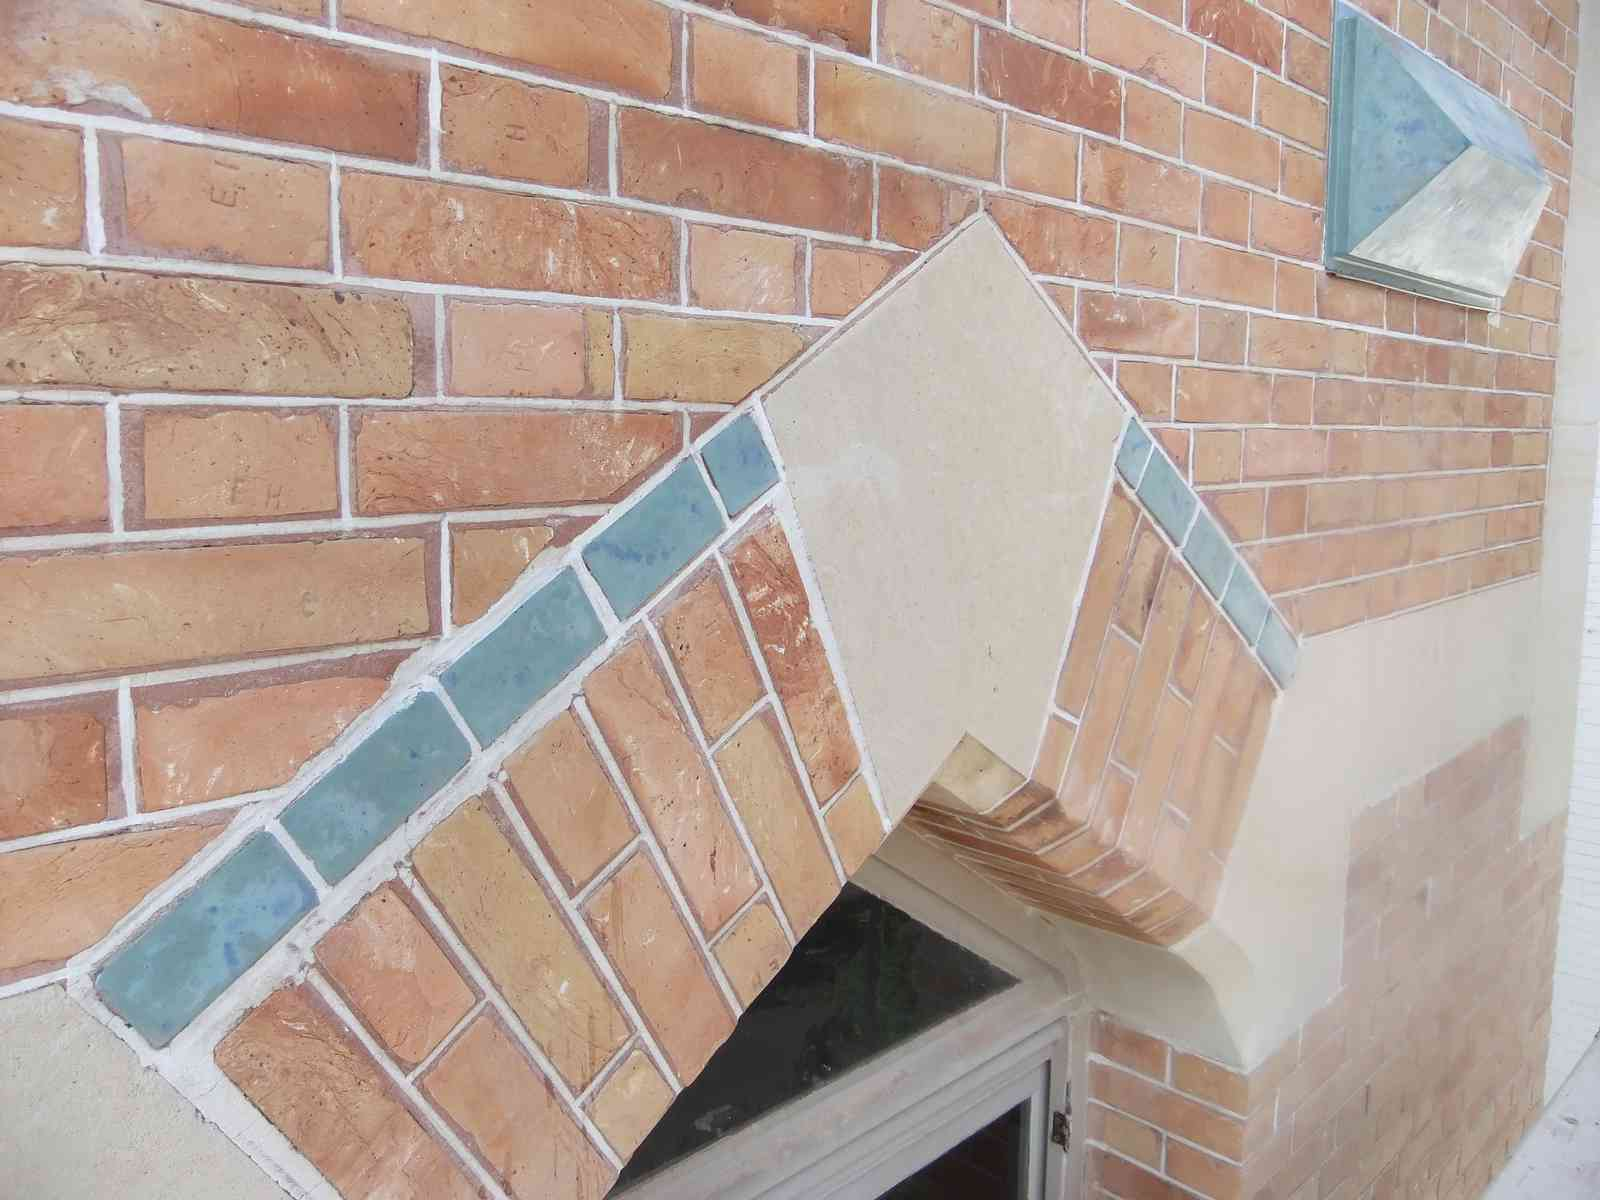 pierre-decor-ceramique-art-restaurarte.jpg